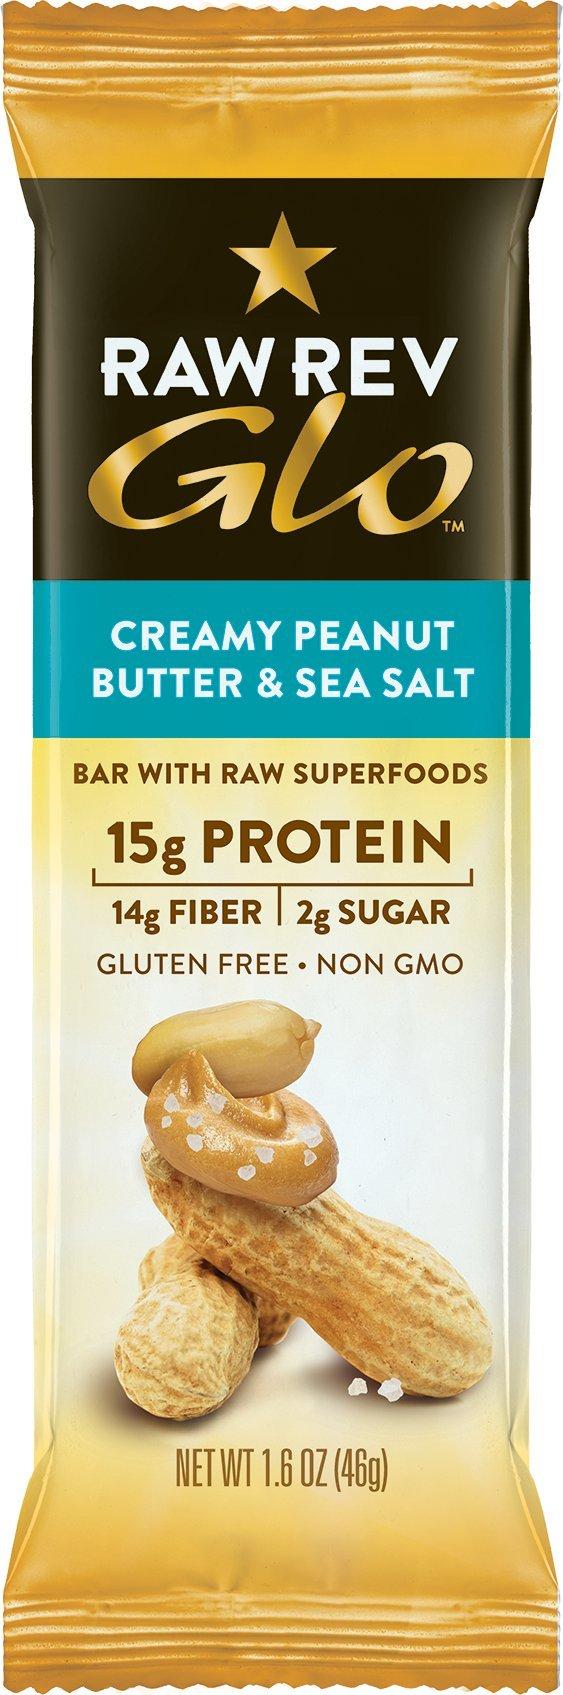 Raw Rev Glo Vegan Gluten-Free Protein Bars, Creamy Peanut Butter & Sea Salt, 12 Count Box of 1.6 Ounce Bars (3 Boxes) 15g Protein, 2g Sugar, 14g Fiber, Keto-Friendly, Vegan, Plant-Based Protein by Raw Rev Glo